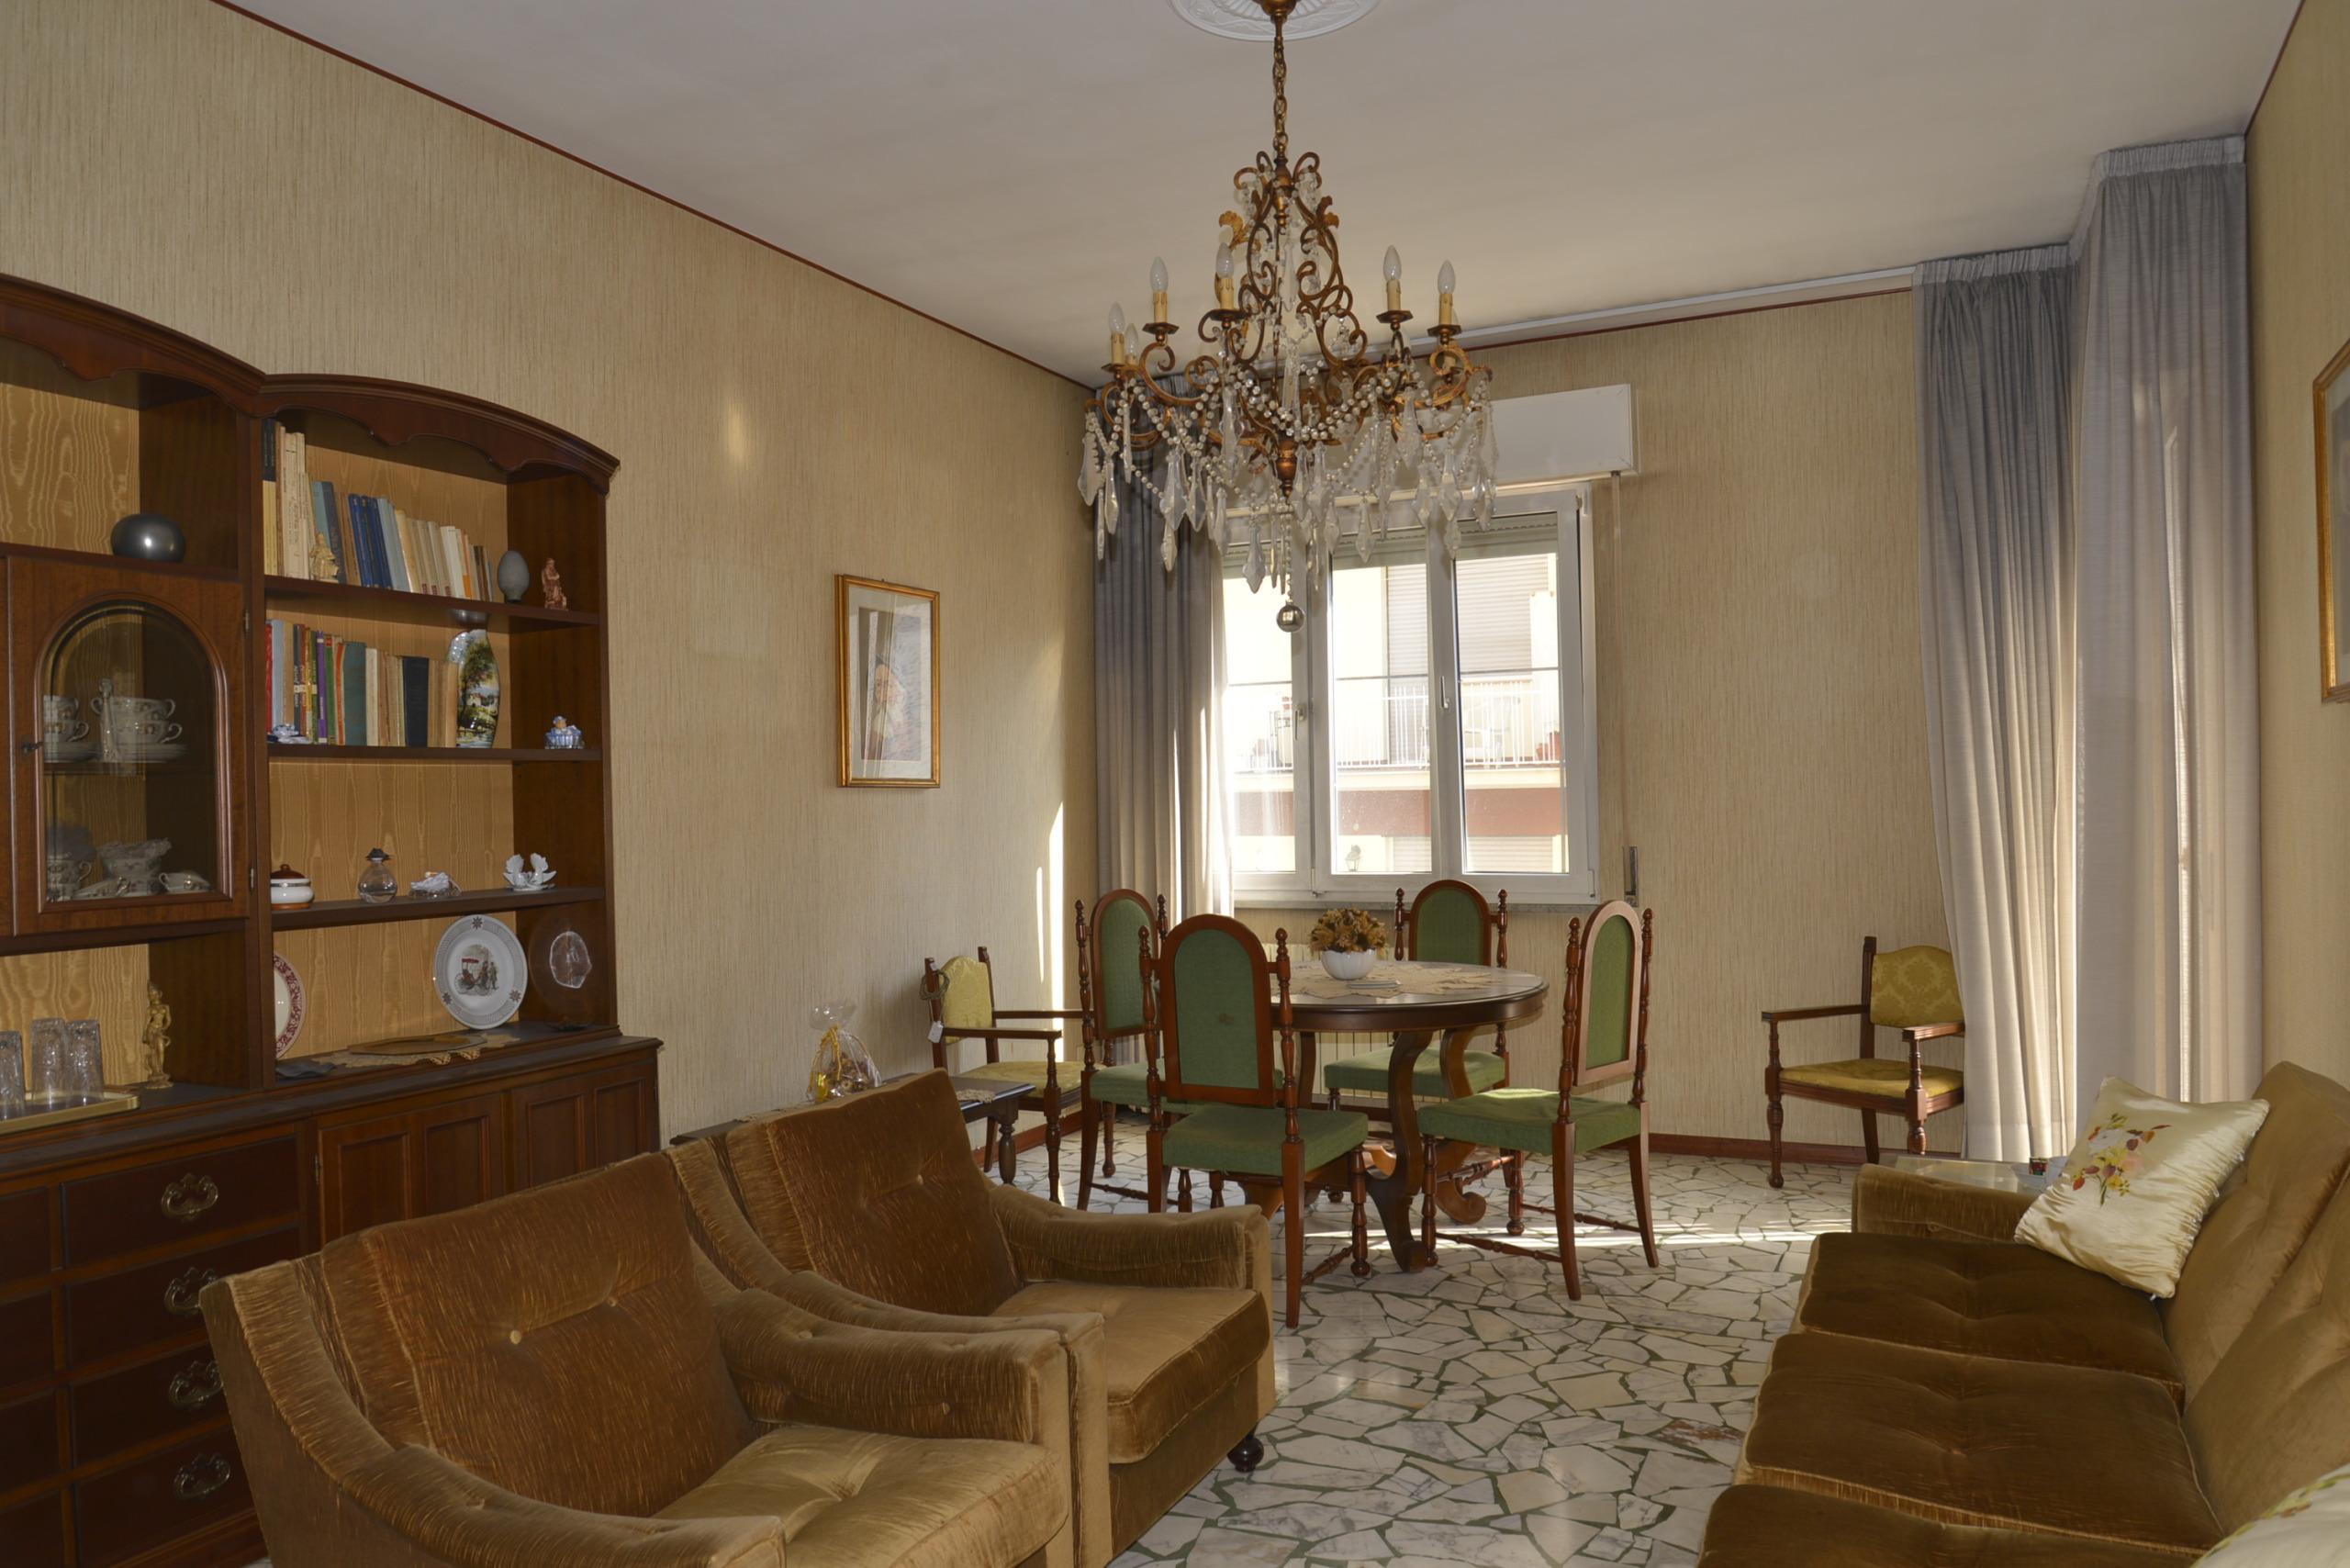 Appartamento - Villapiana, Savona